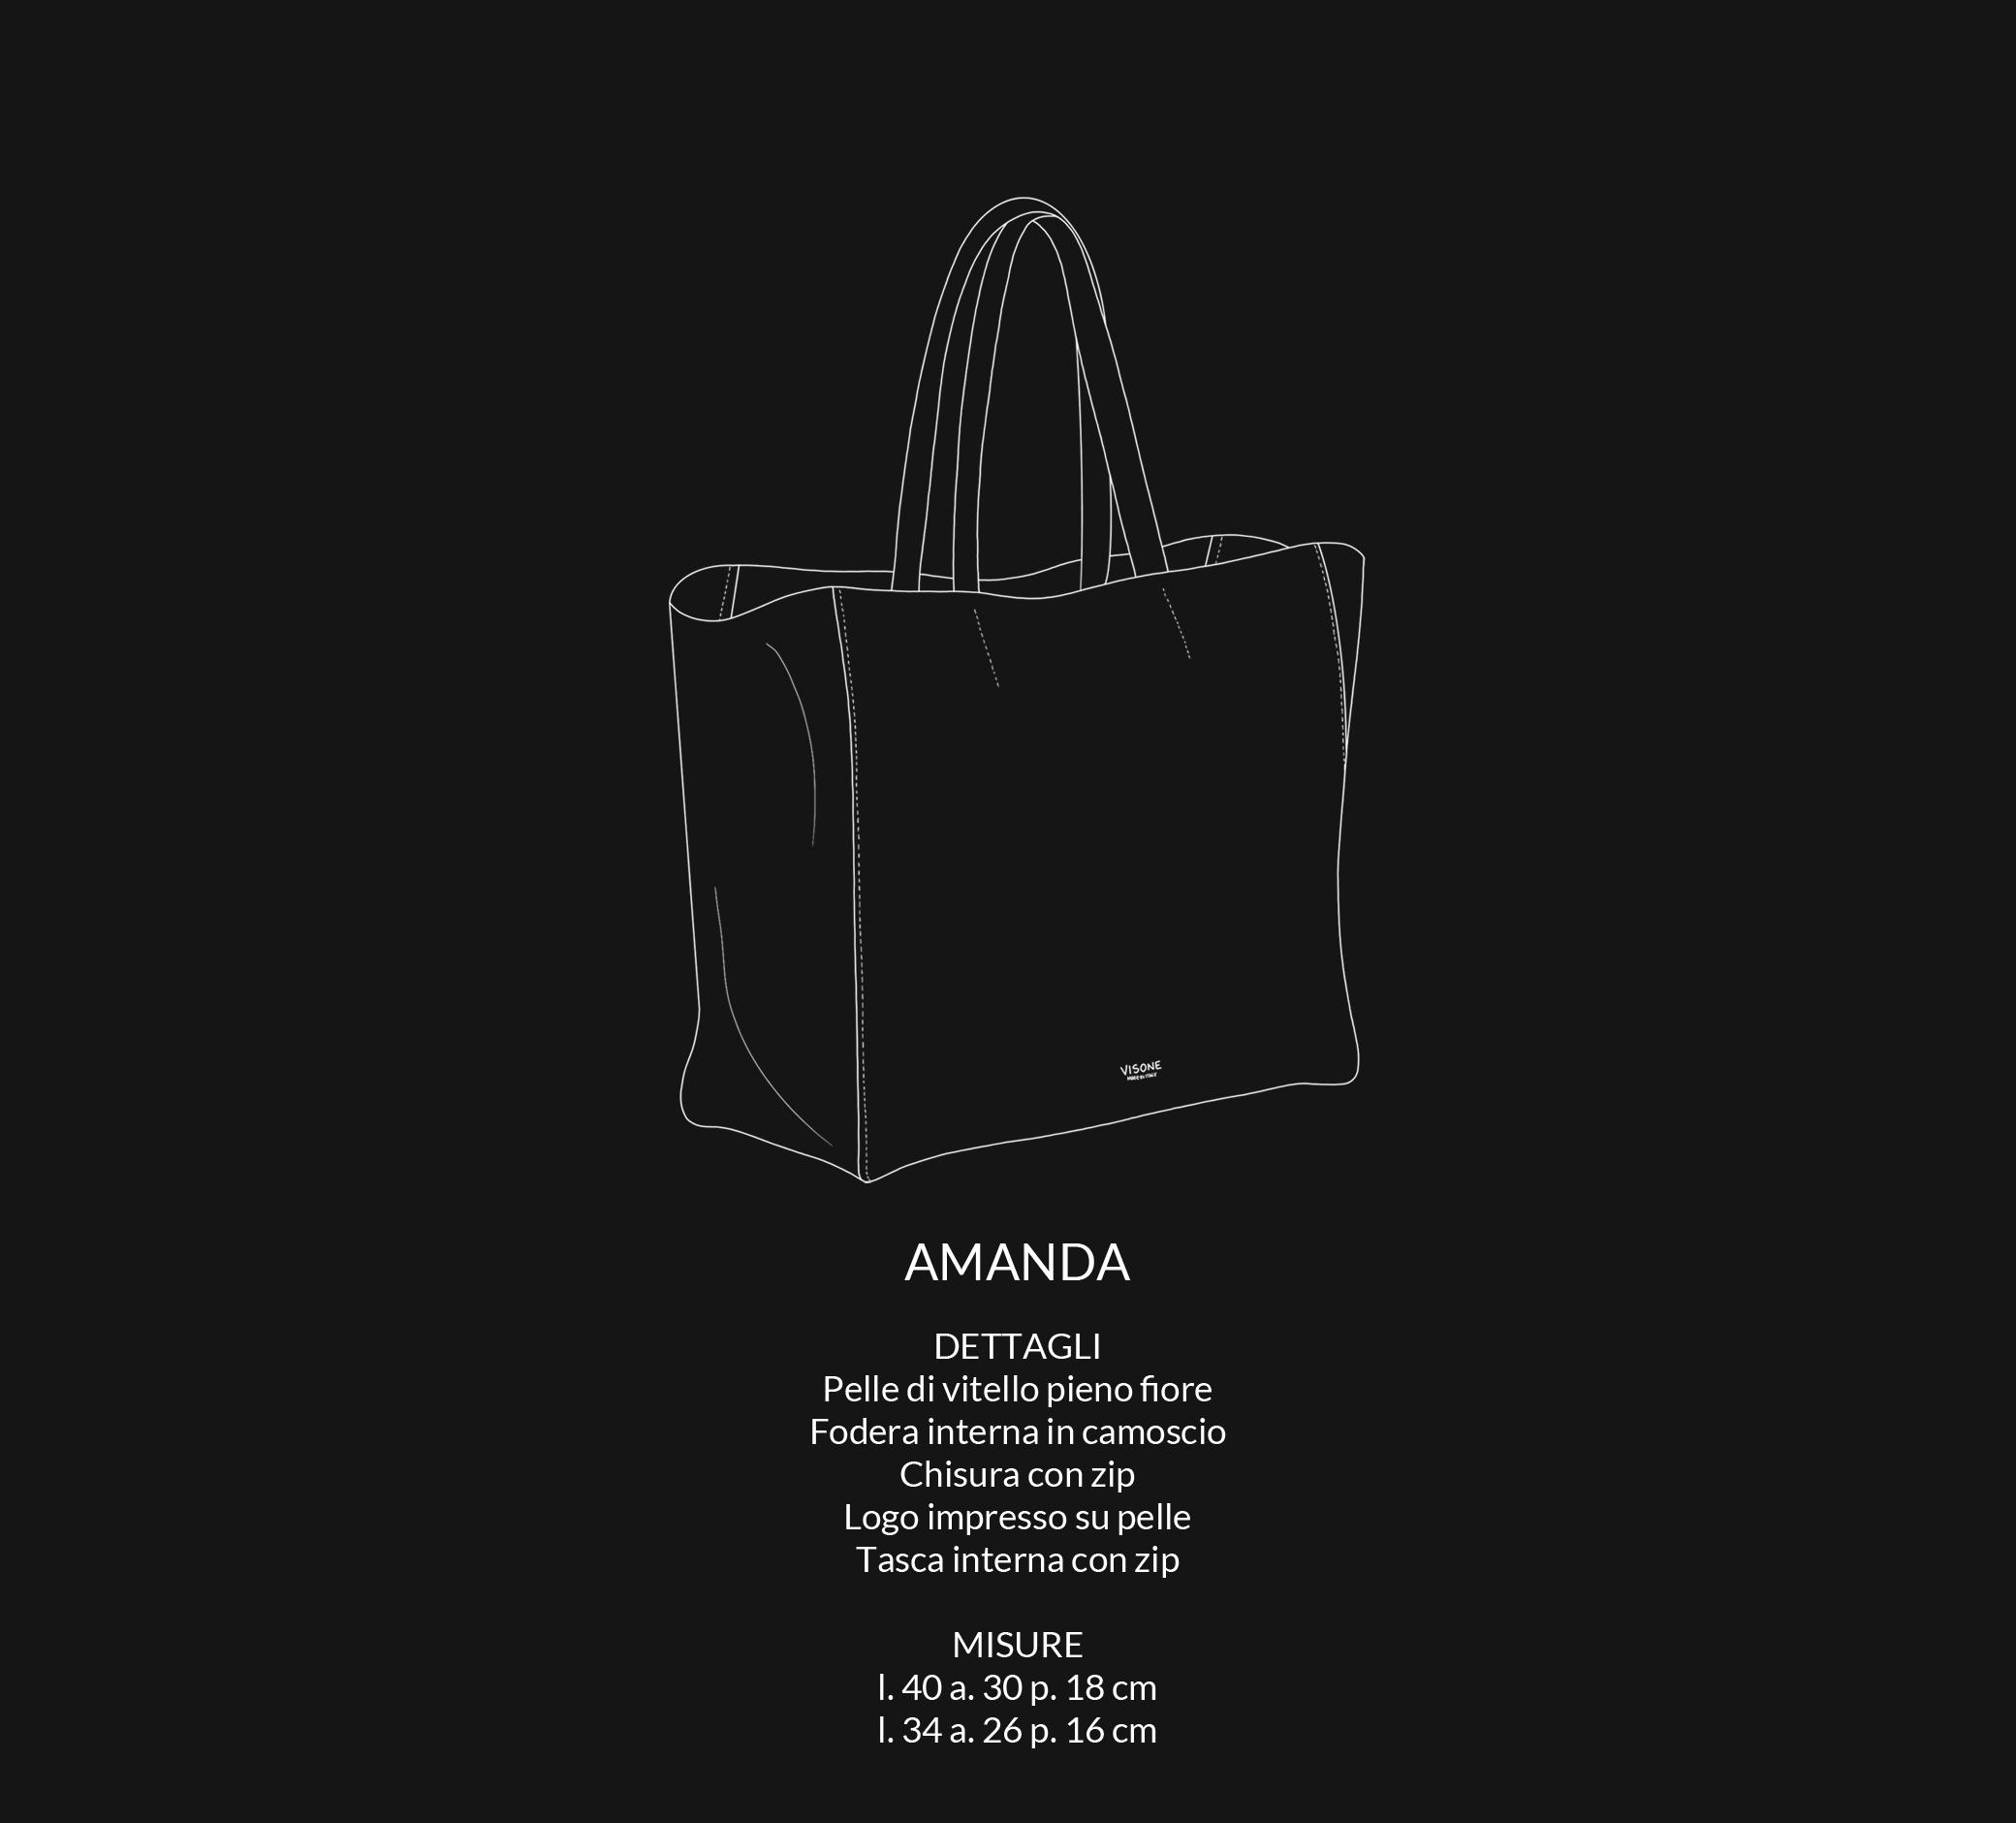 amandacategoria-1